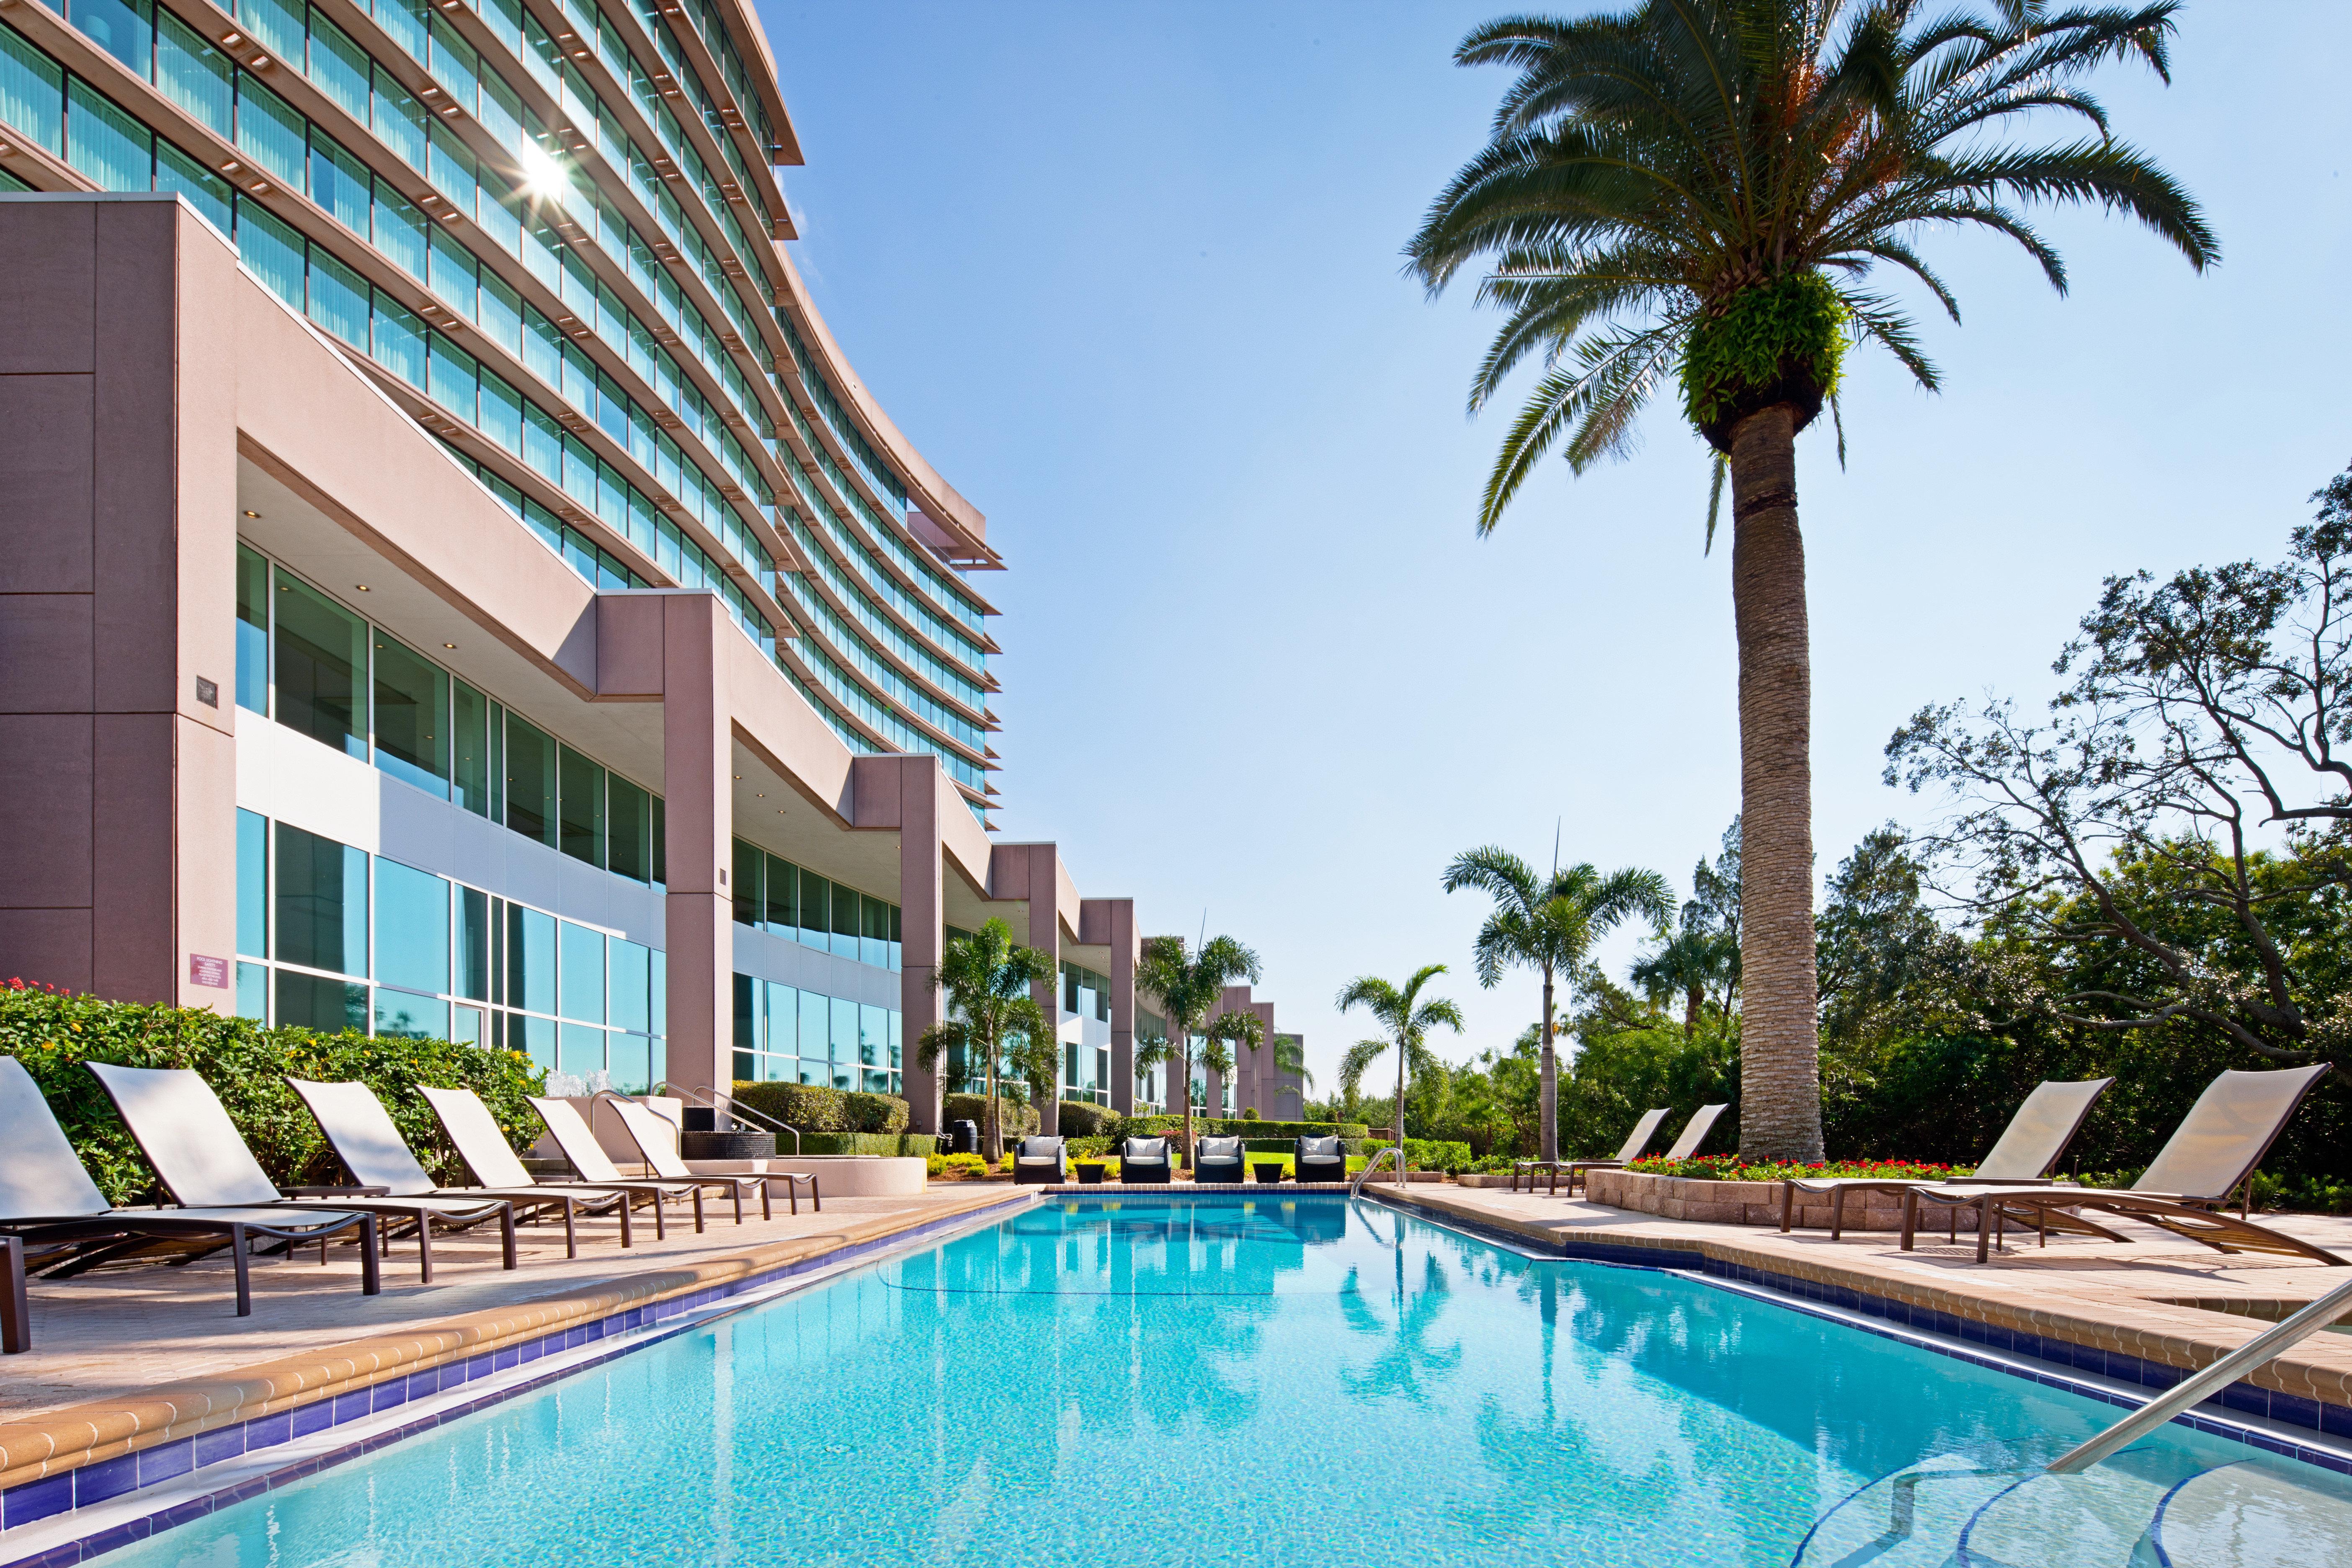 building Resort Pool swimming pool leisure condominium property plaza arecales Villa palm lined swimming